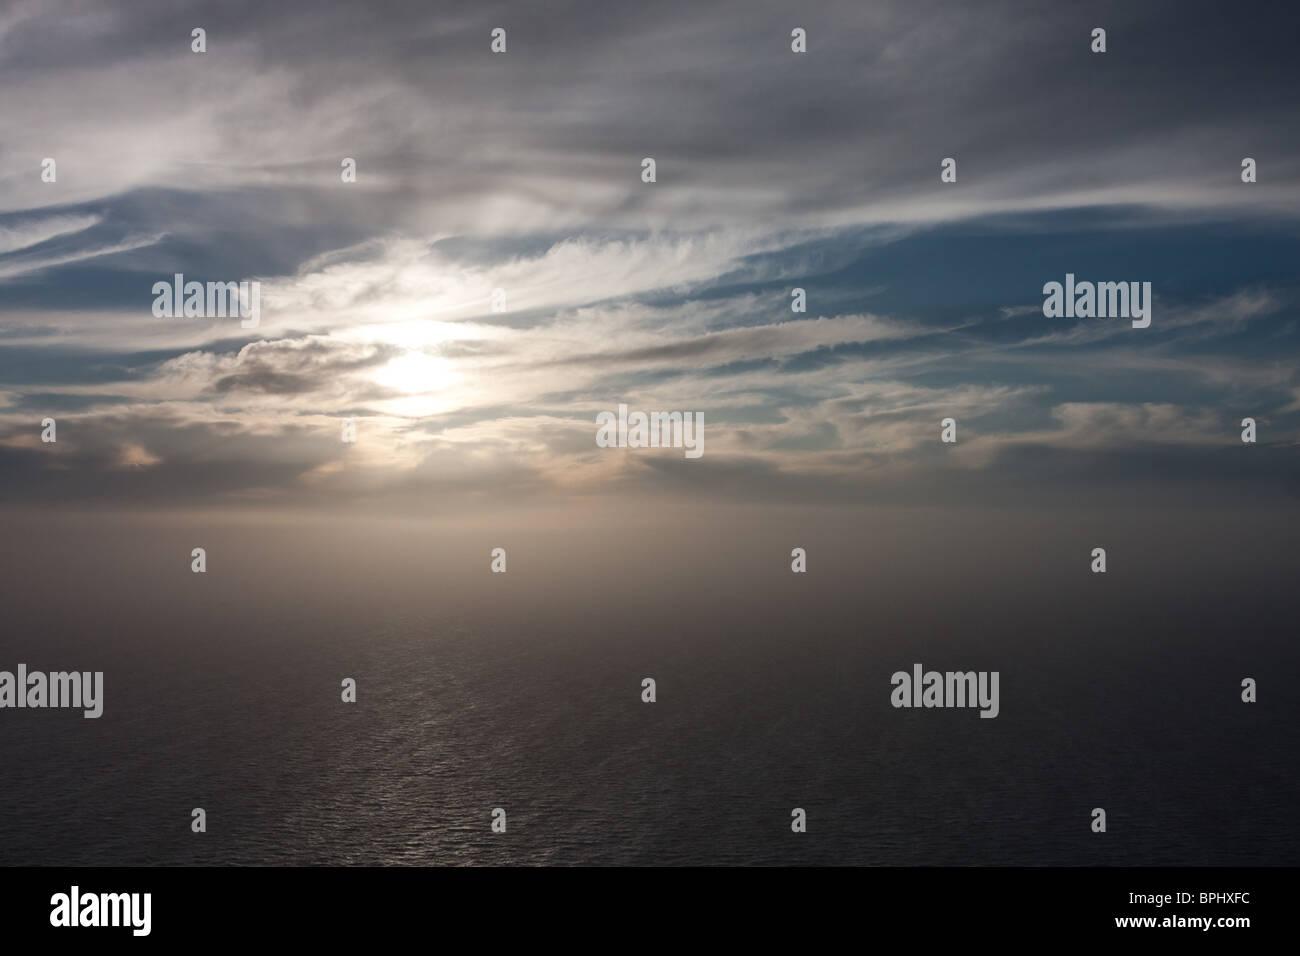 The Sahara dust phenomenon reaching the coast of the Peloponnese, Greece - Stock Image